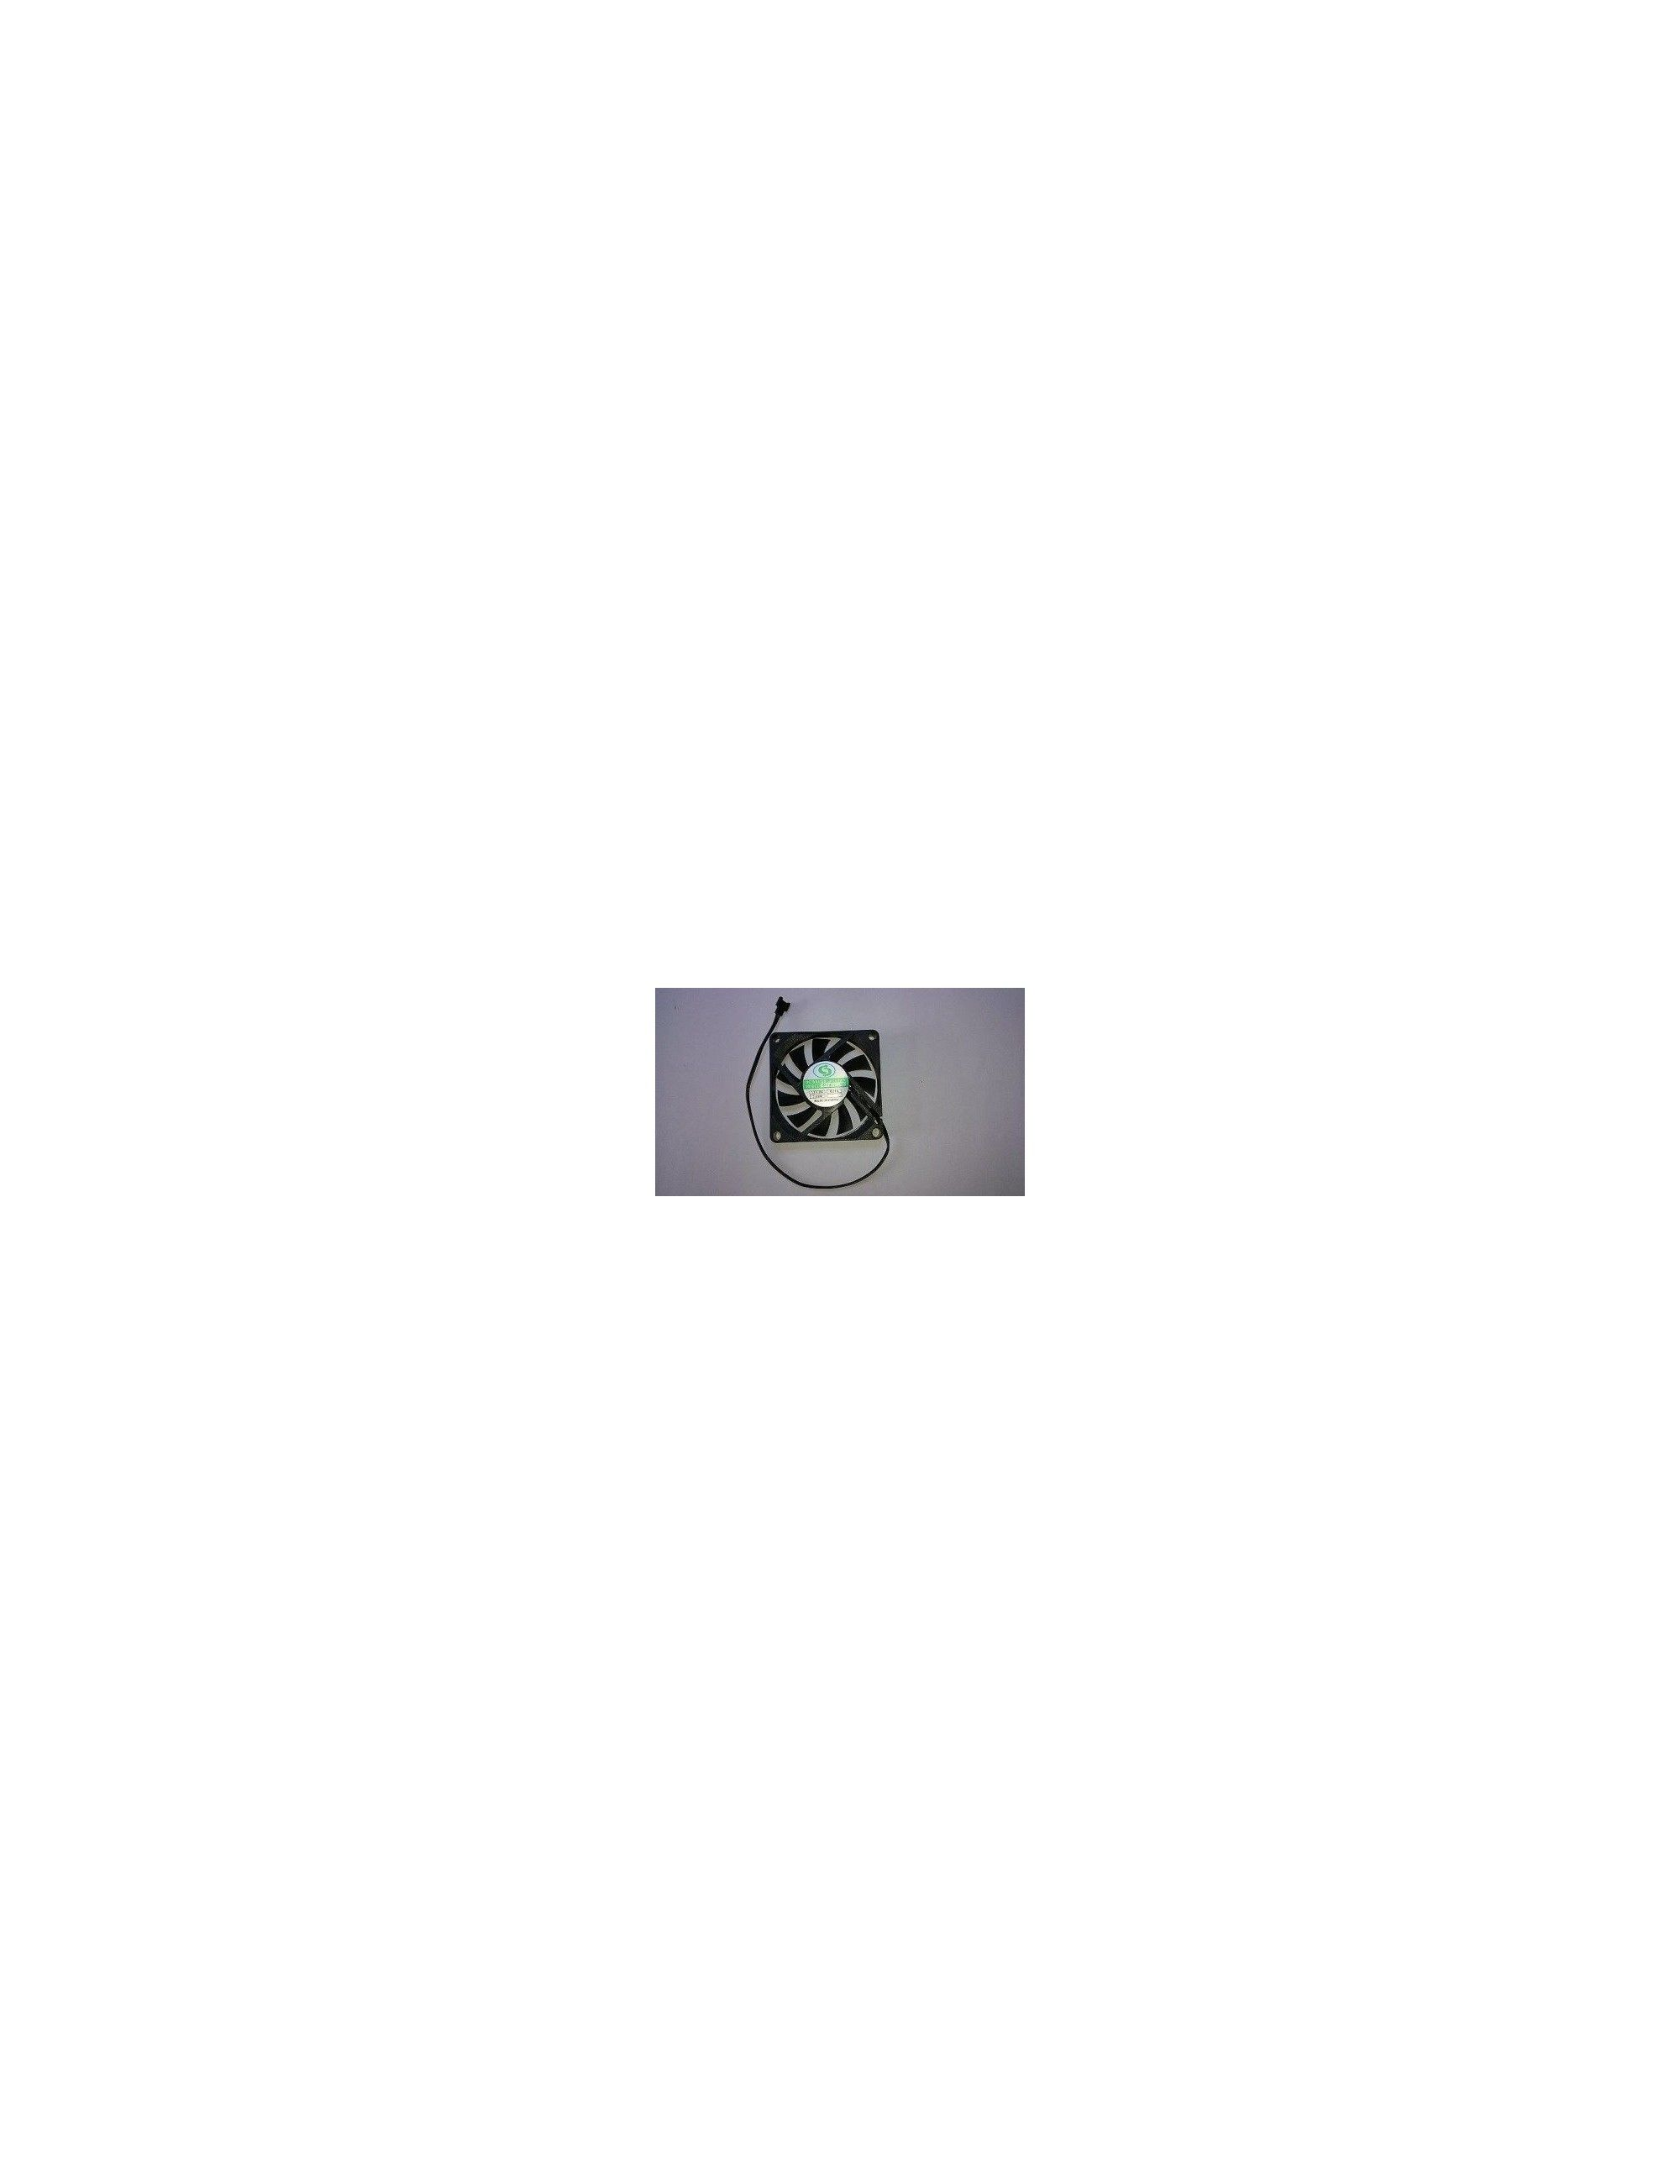 MAXSPECT - Ventilateur pour Maxspect R420r